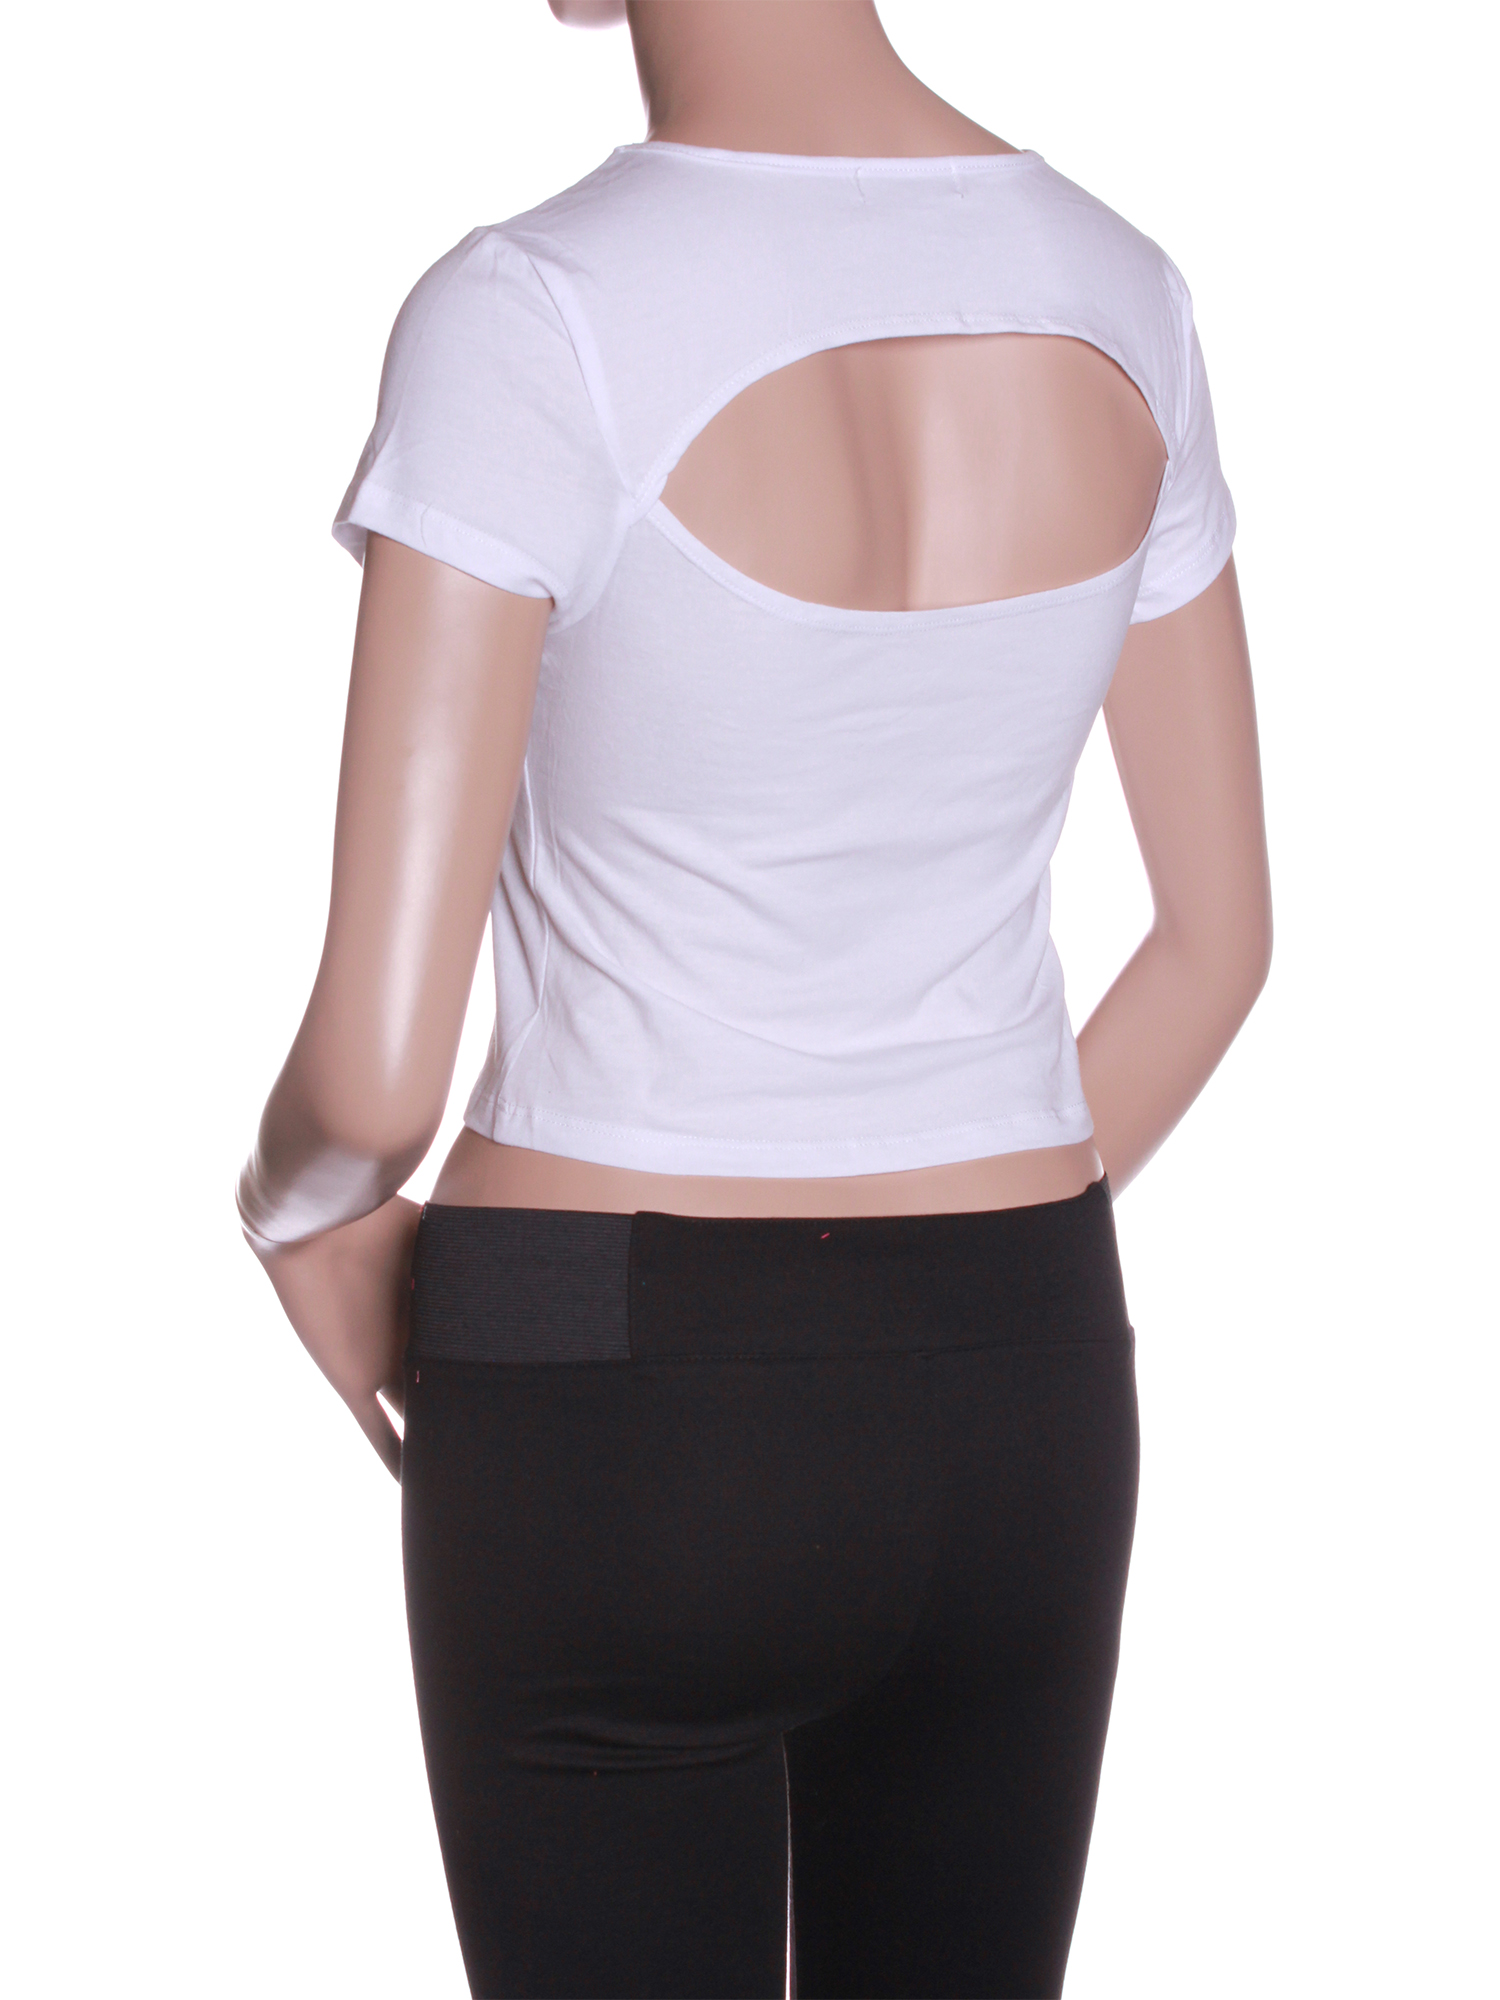 Emmalise Women Sexy Fashion Crop Top Tee Short Sleeves Shirt - Junior Sizes